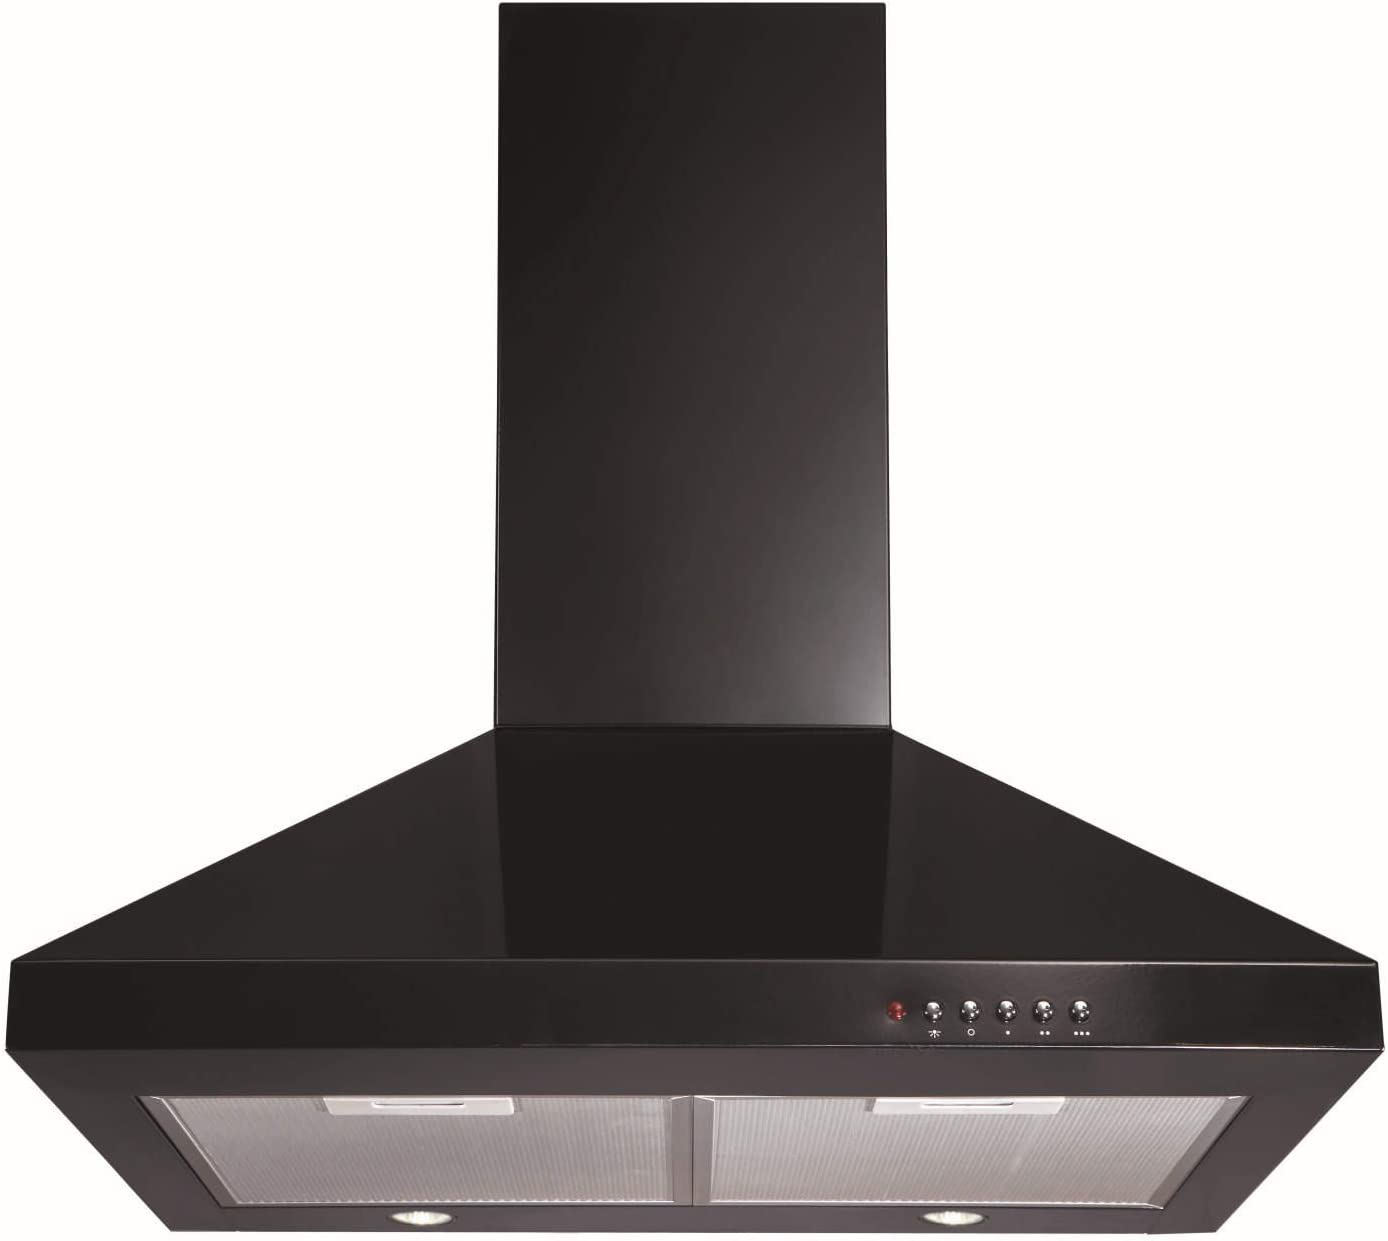 Campana extractora, de CDA, negra, de 60 cm de ancho, modelo ECH61BL: Amazon.es: Grandes electrodomésticos